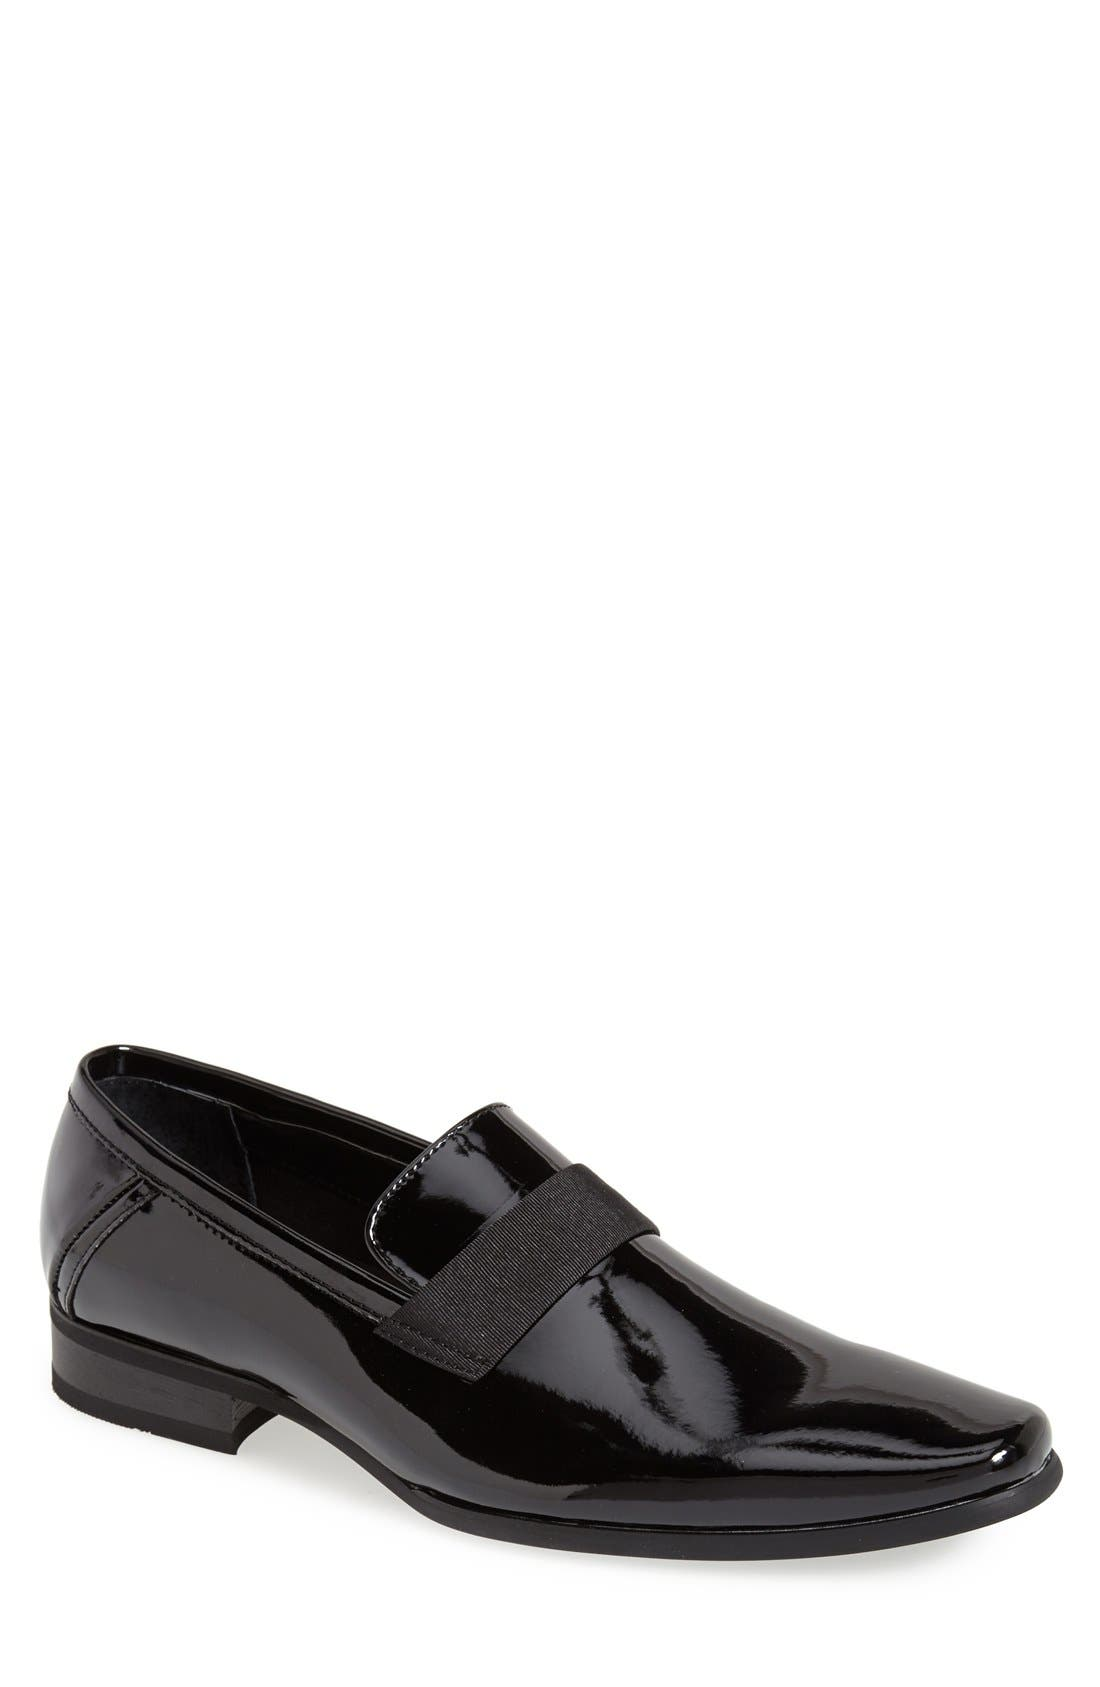 CALVIN KLEIN 'Bernard' Venetian Loafer, Main, color, BLACK